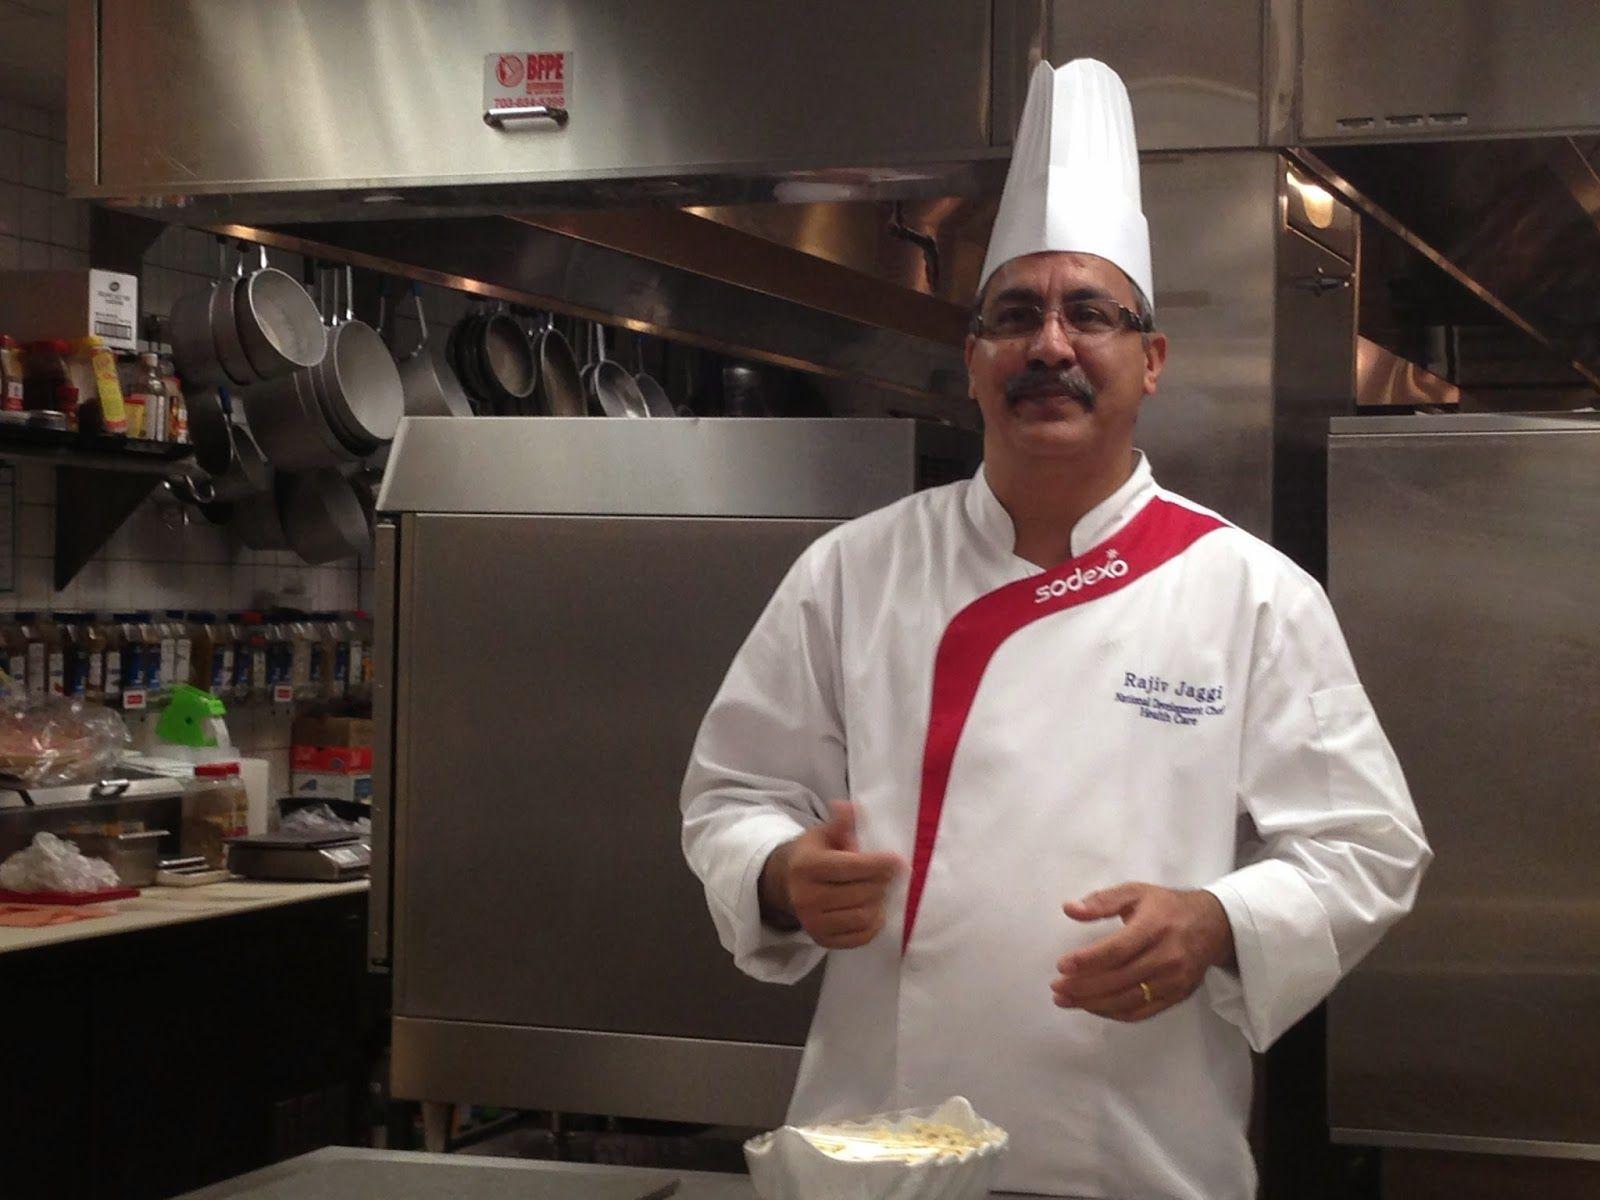 Sodexo Chef Jobs Chef Jobs Training And Development Chef Jackets